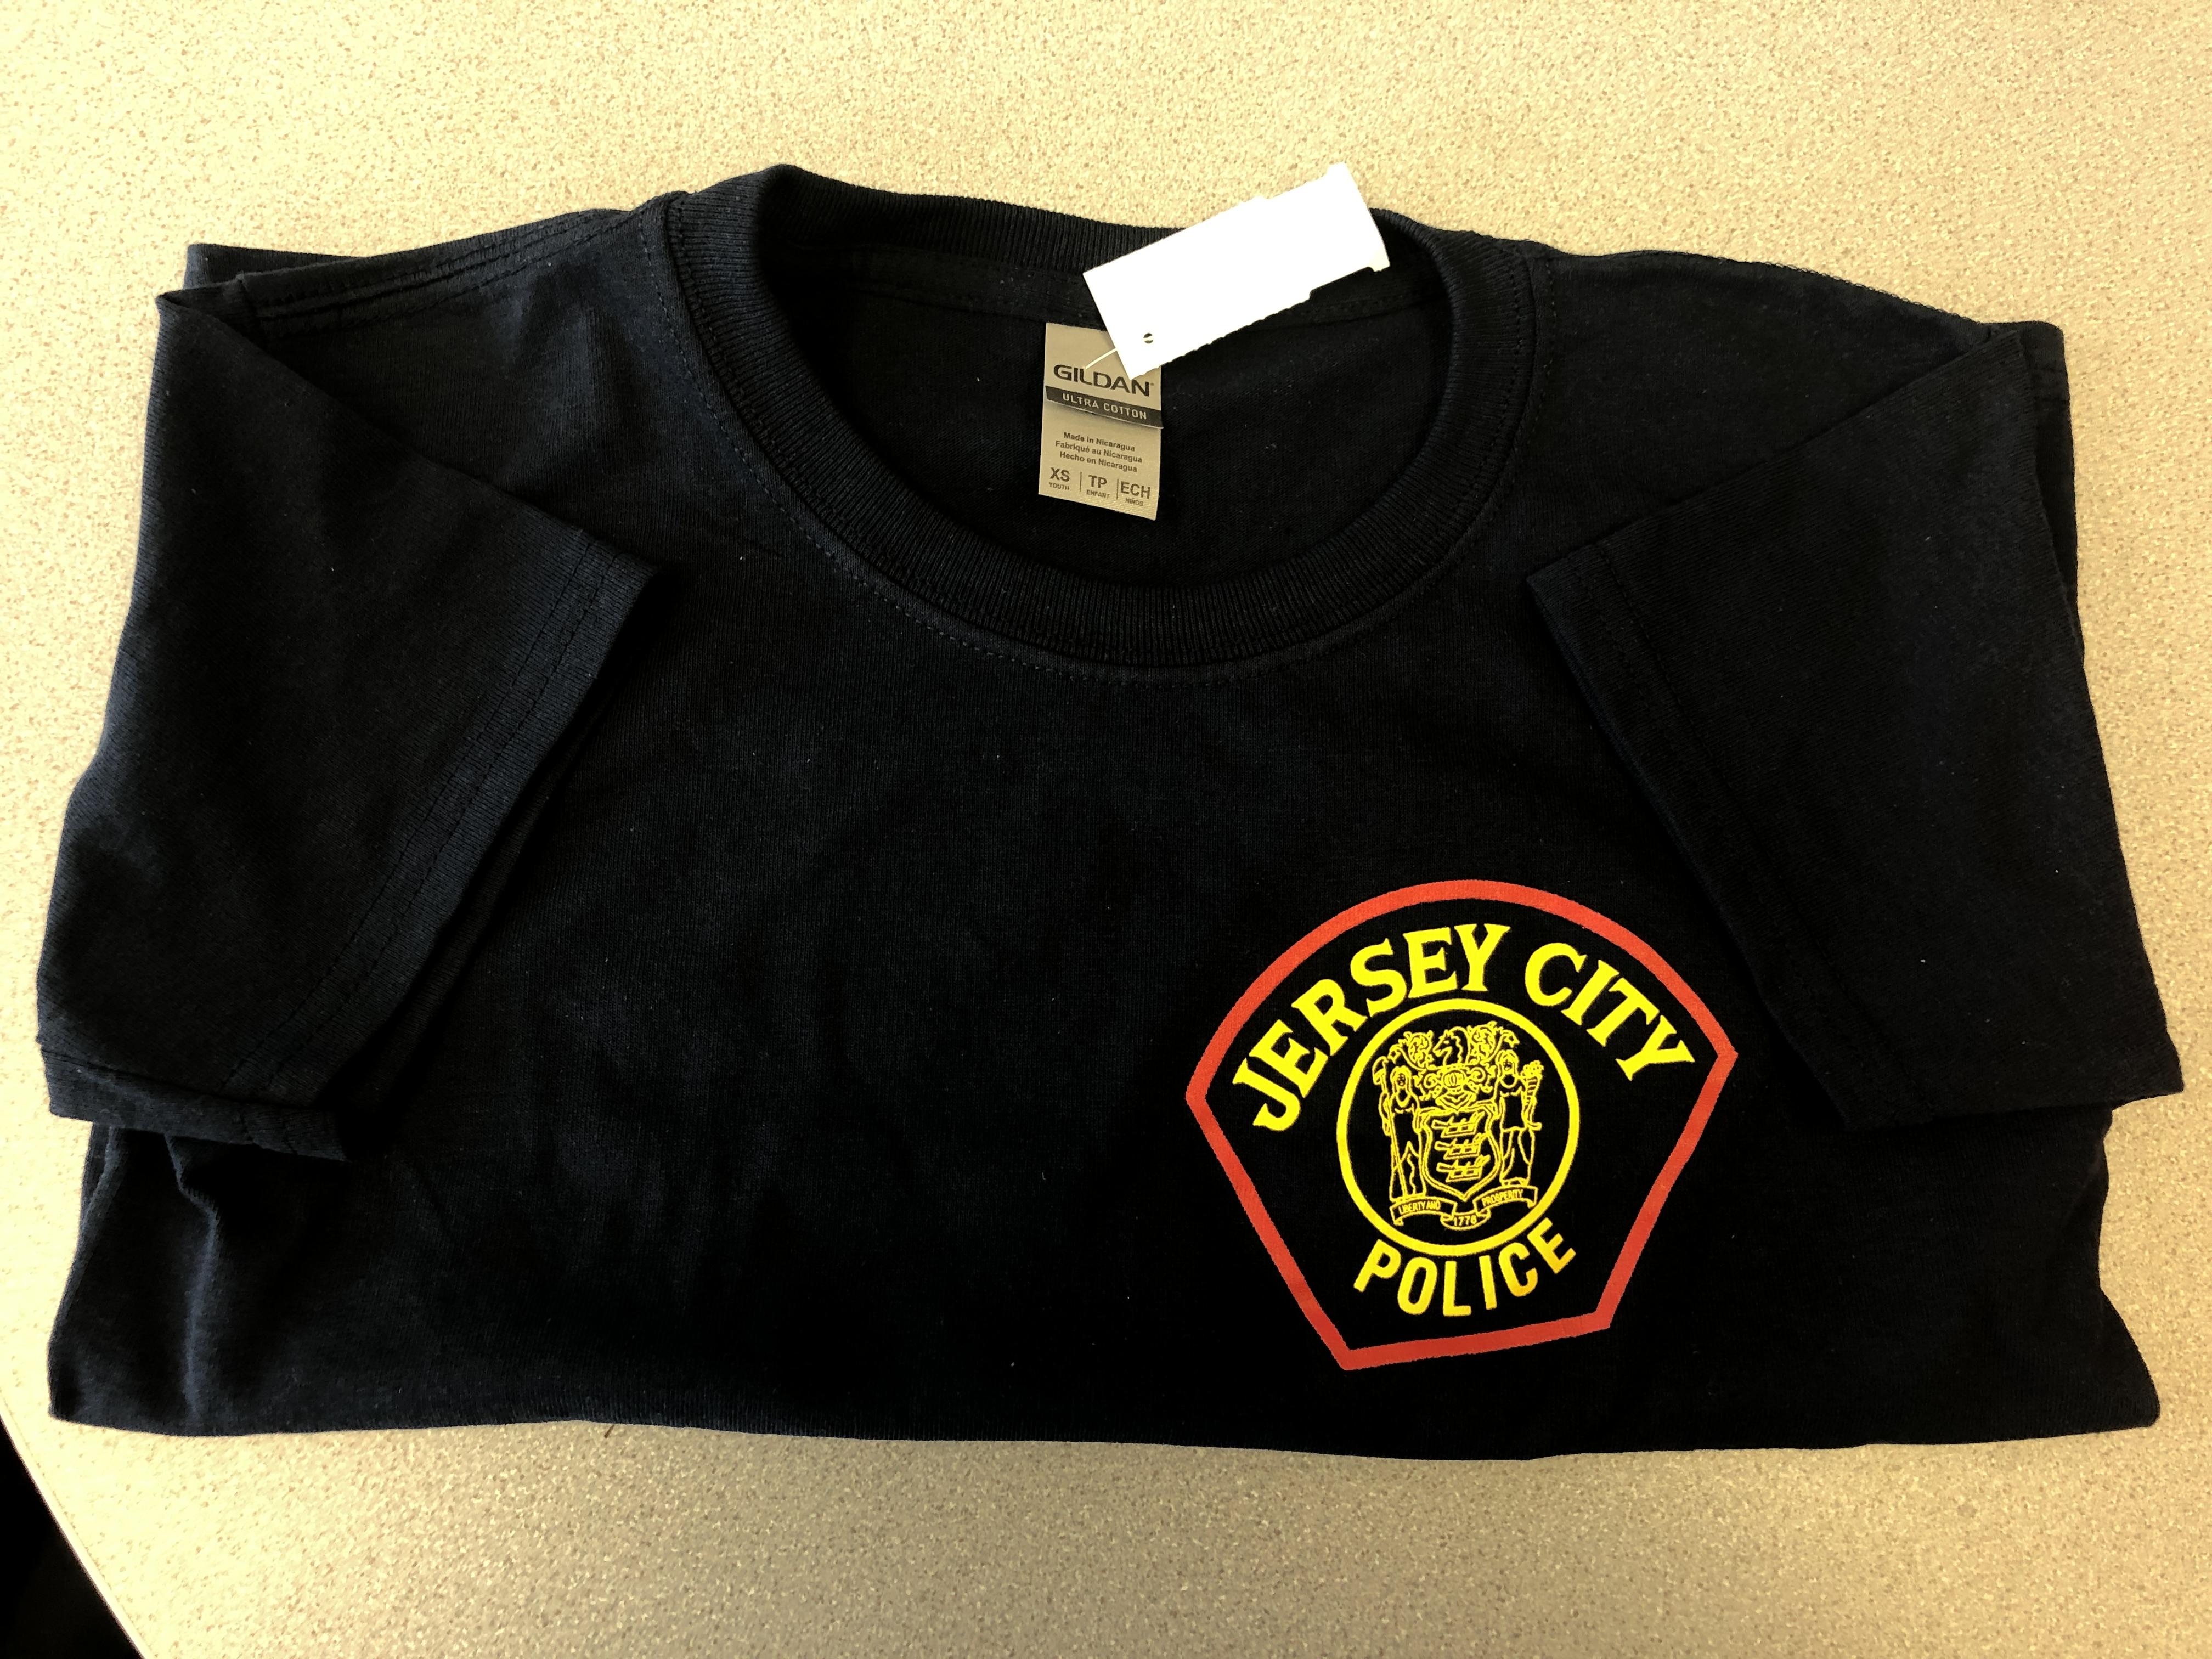 JERSEY CITY POLICE T-SHIRT-